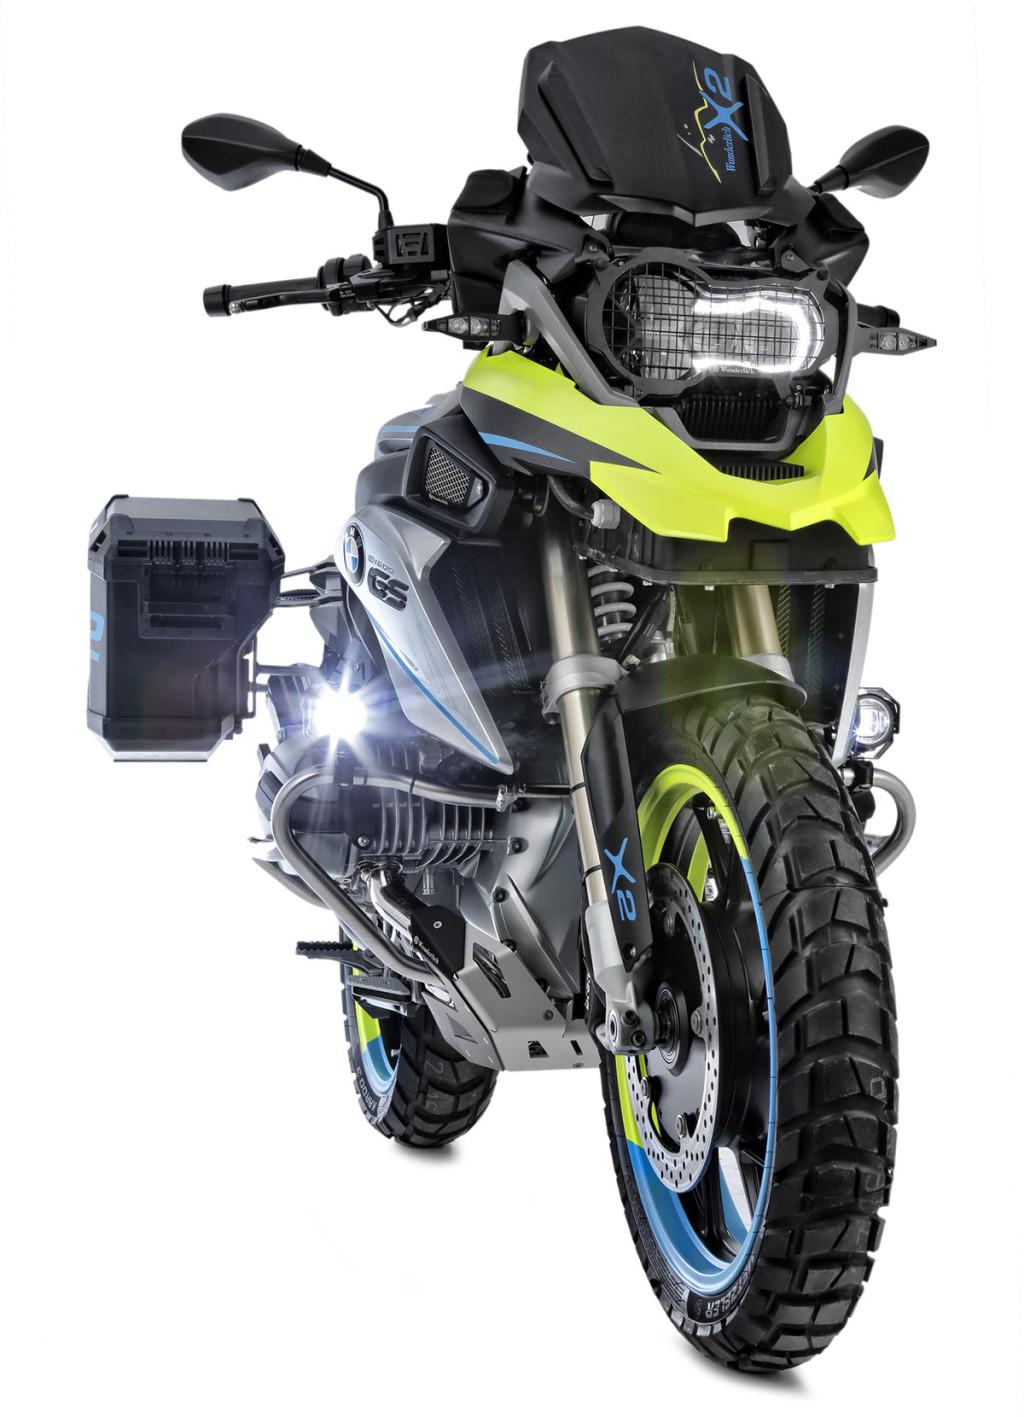 Wunderlich-Hybrid-Motorrad-BMW-R-1200-GS-LC-3